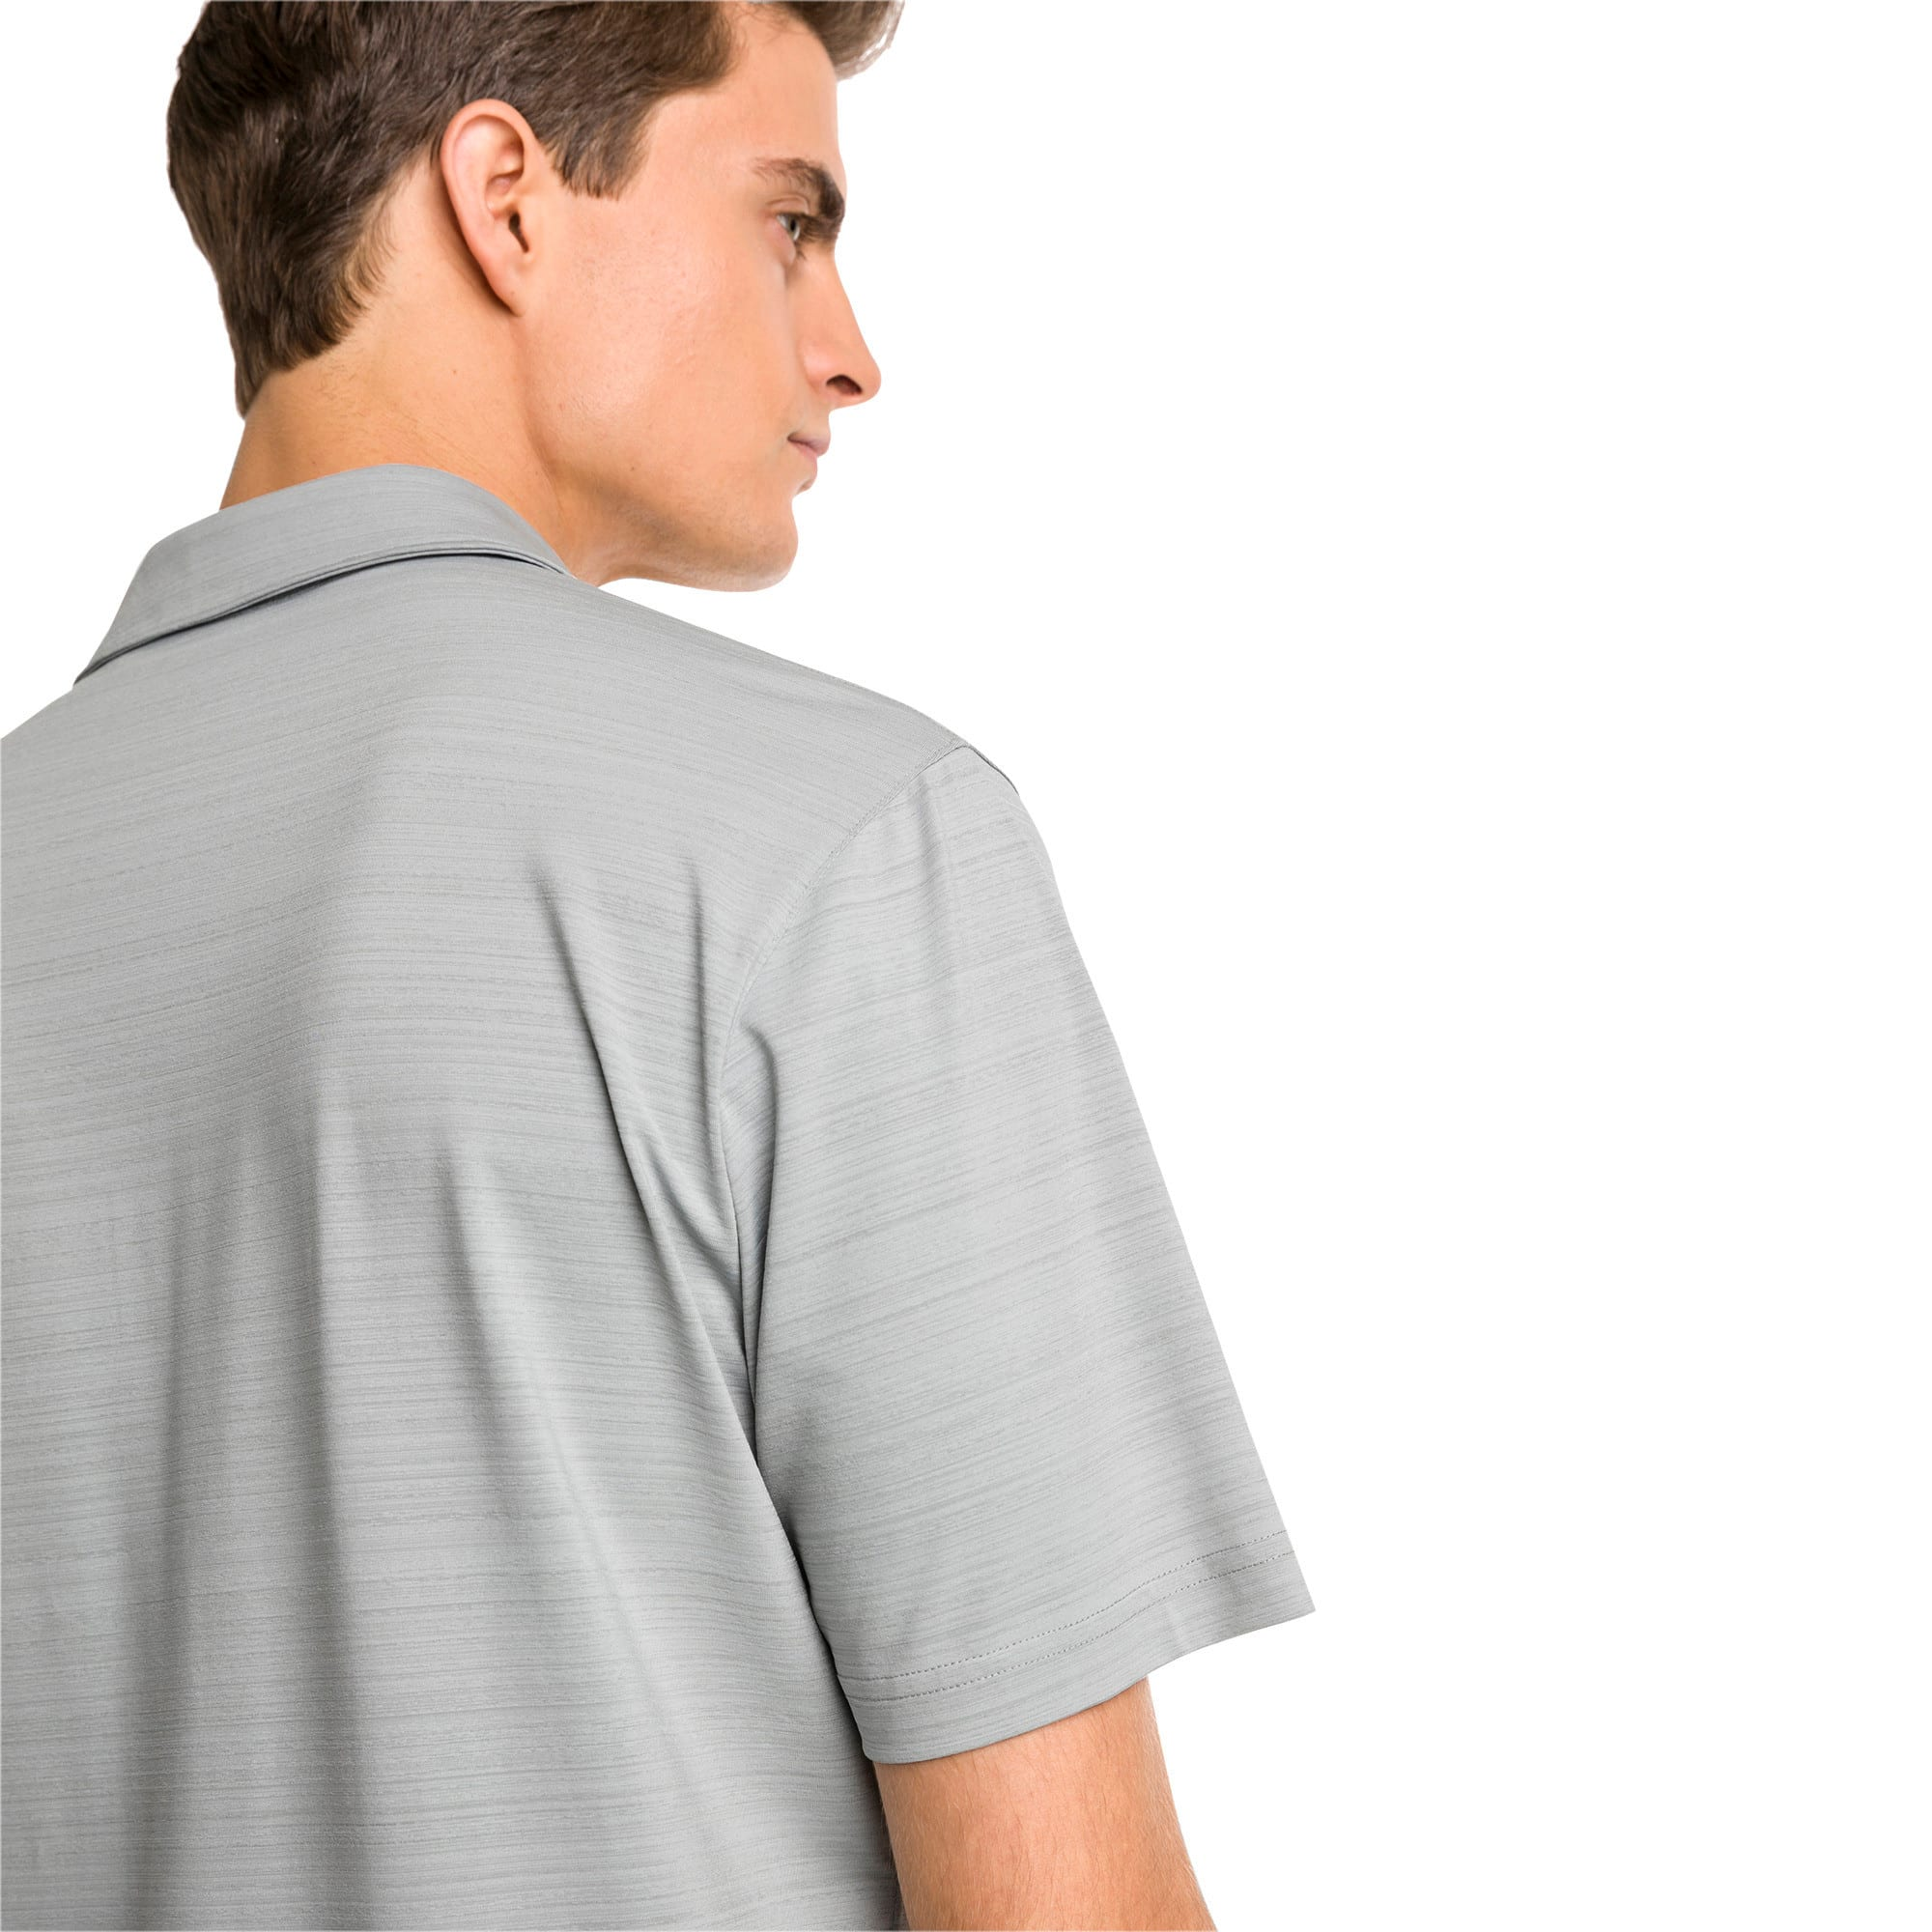 Thumbnail 2 of Breezer Short Sleeve Men's Golf Shirt, Quarry, medium